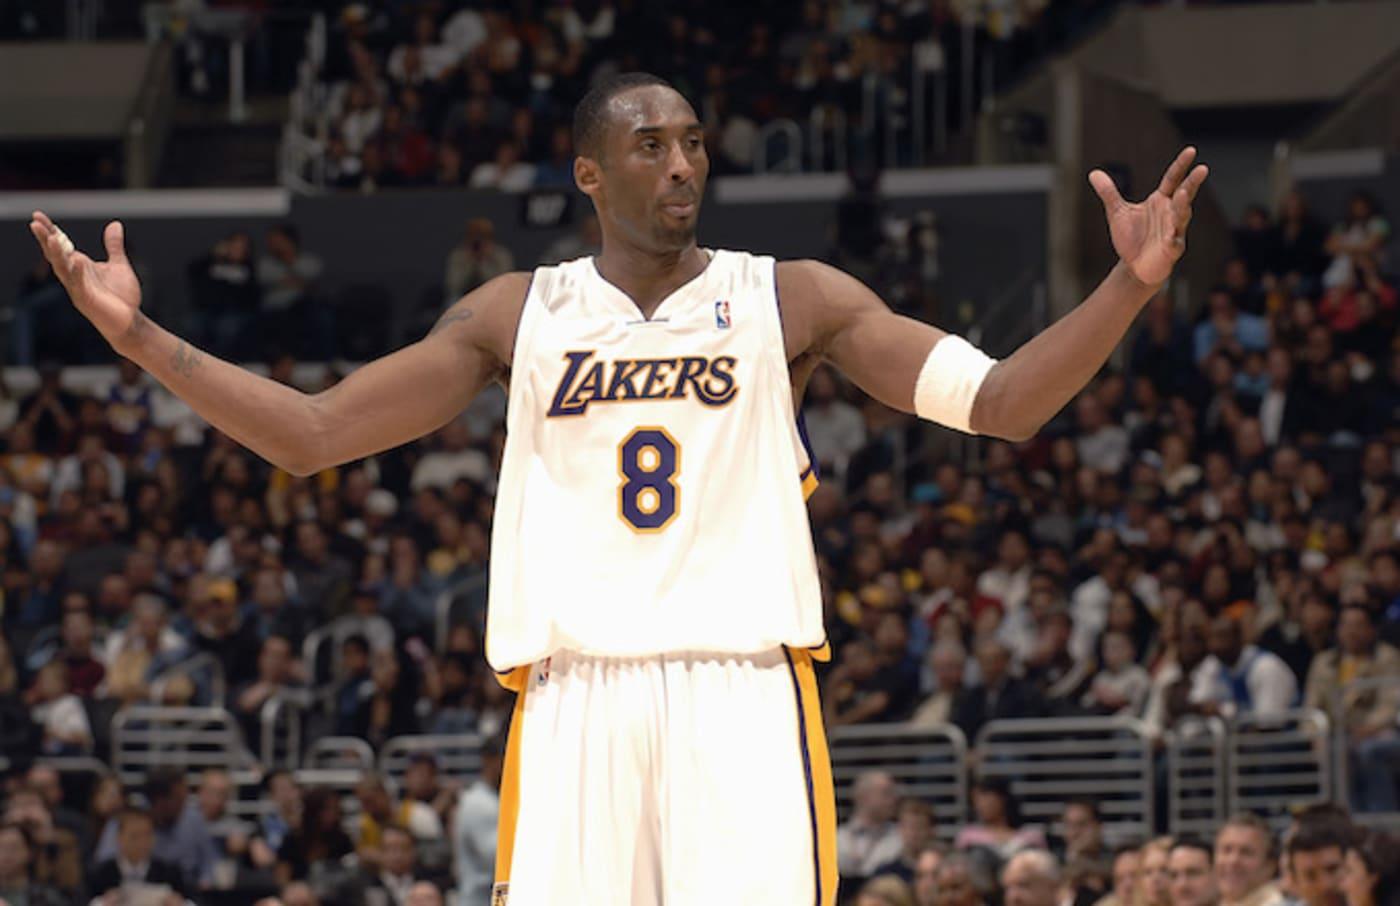 Kobe Bryant scores 81 points against the Toronto Raptors.